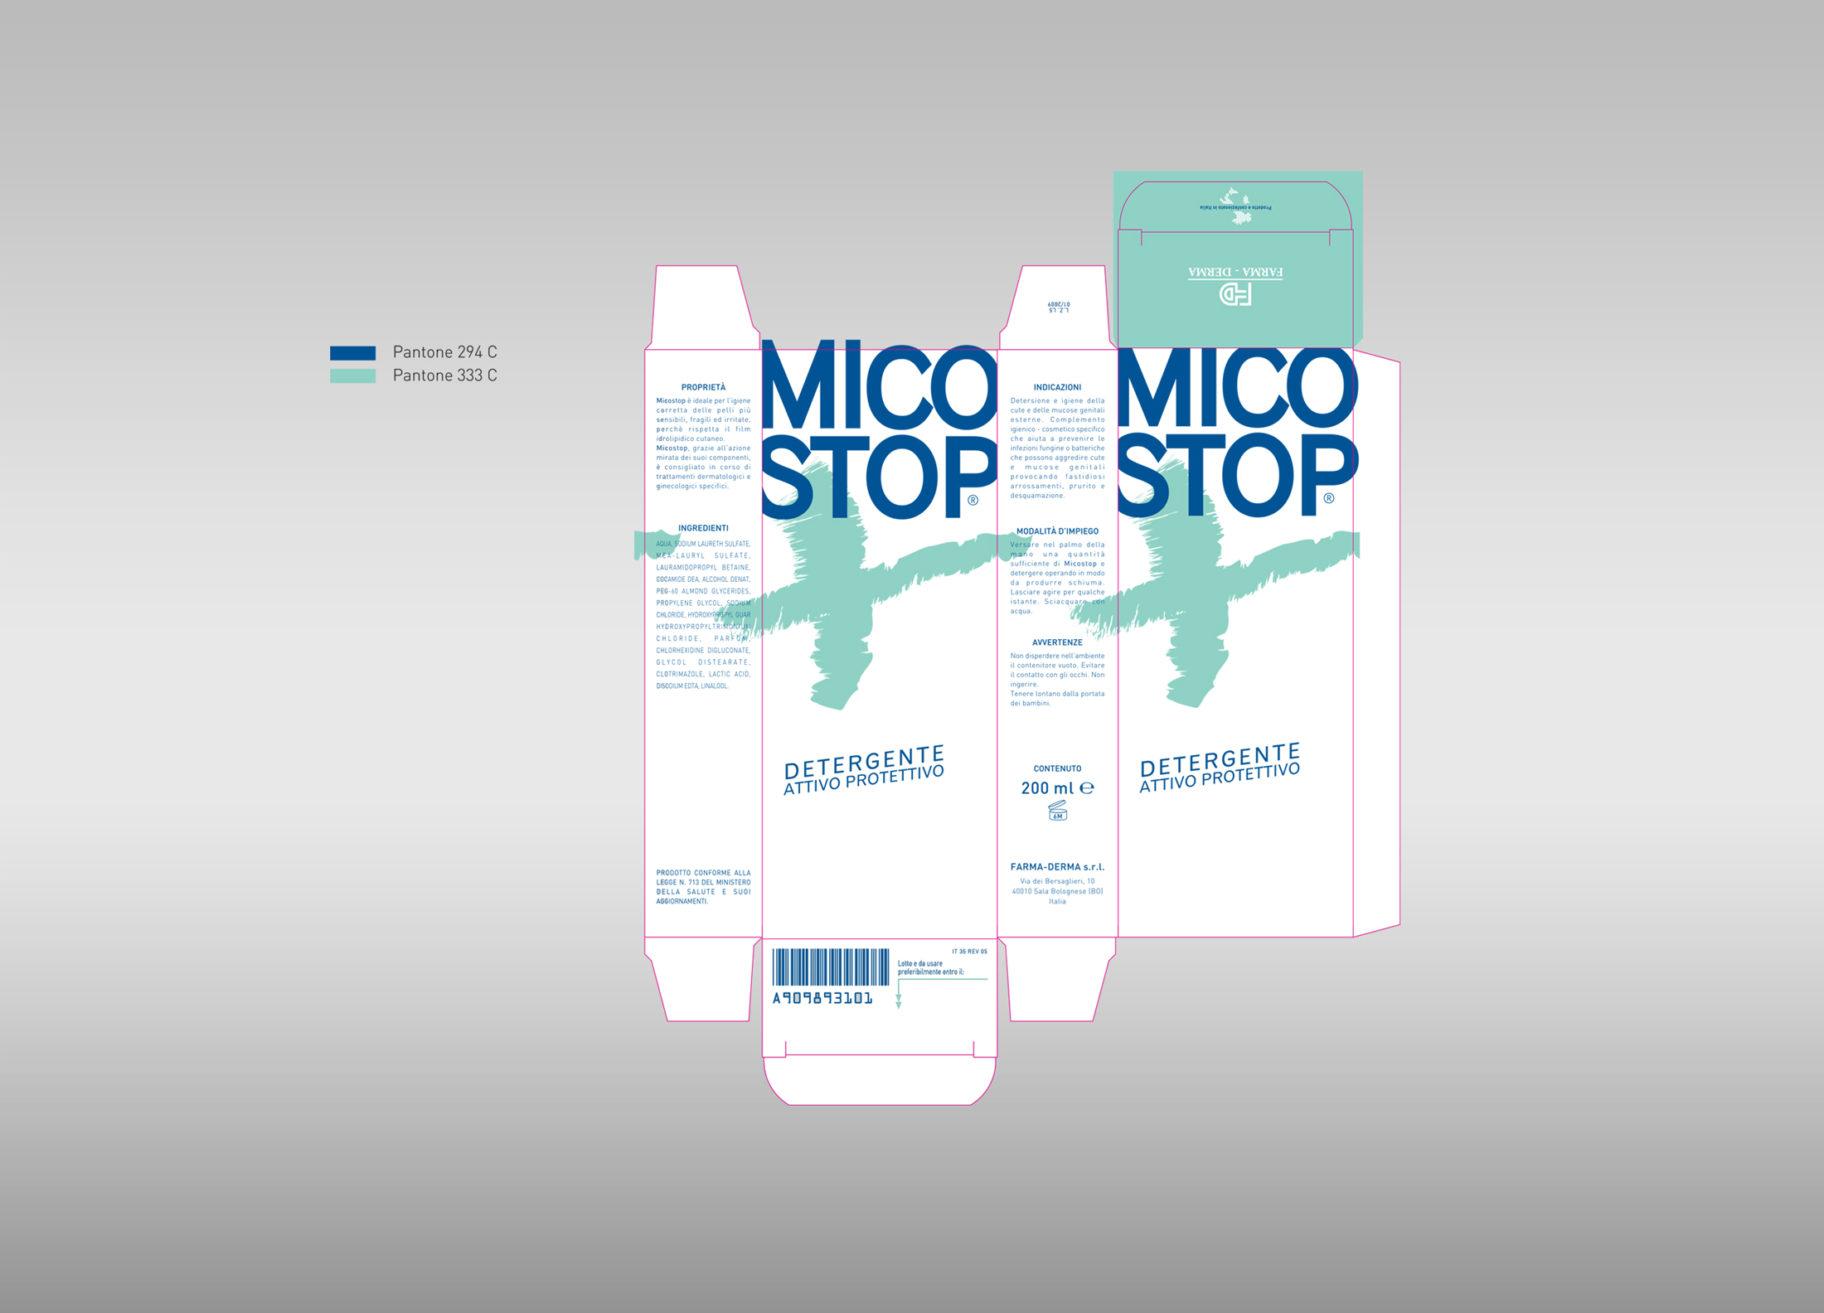 micostop-detergente-fustella-packaging